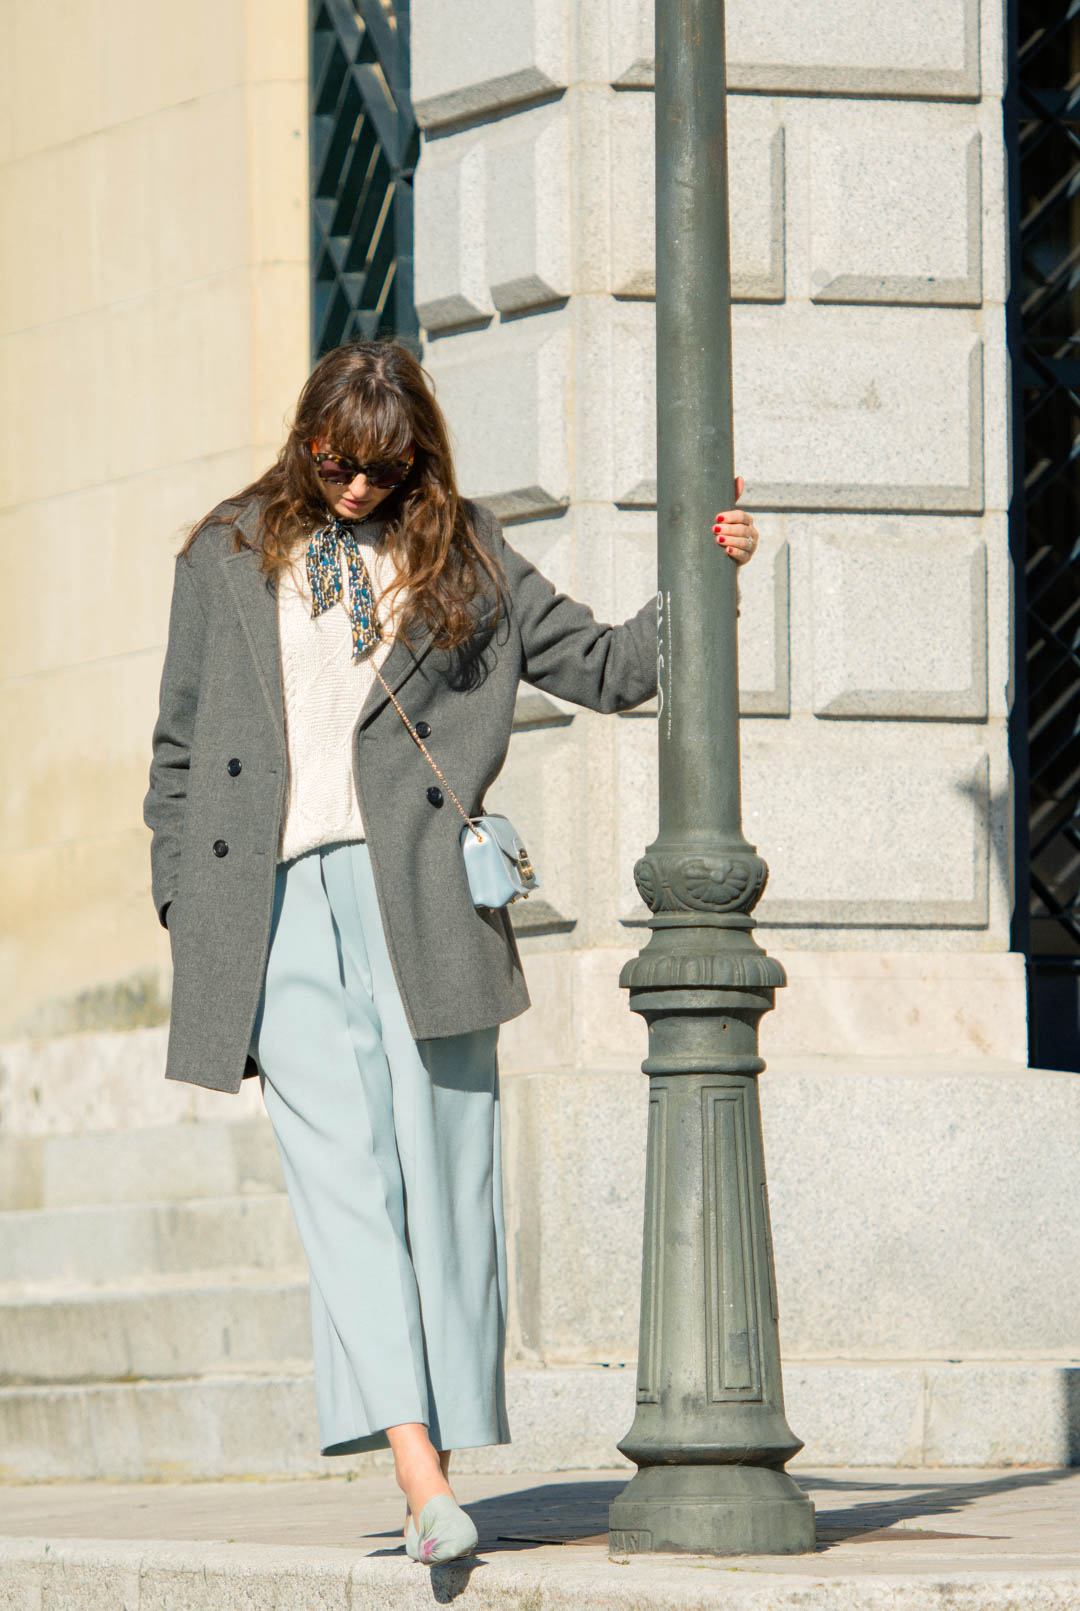 mayte-de-la-iglesia-street-style-mitmeblog-web-02